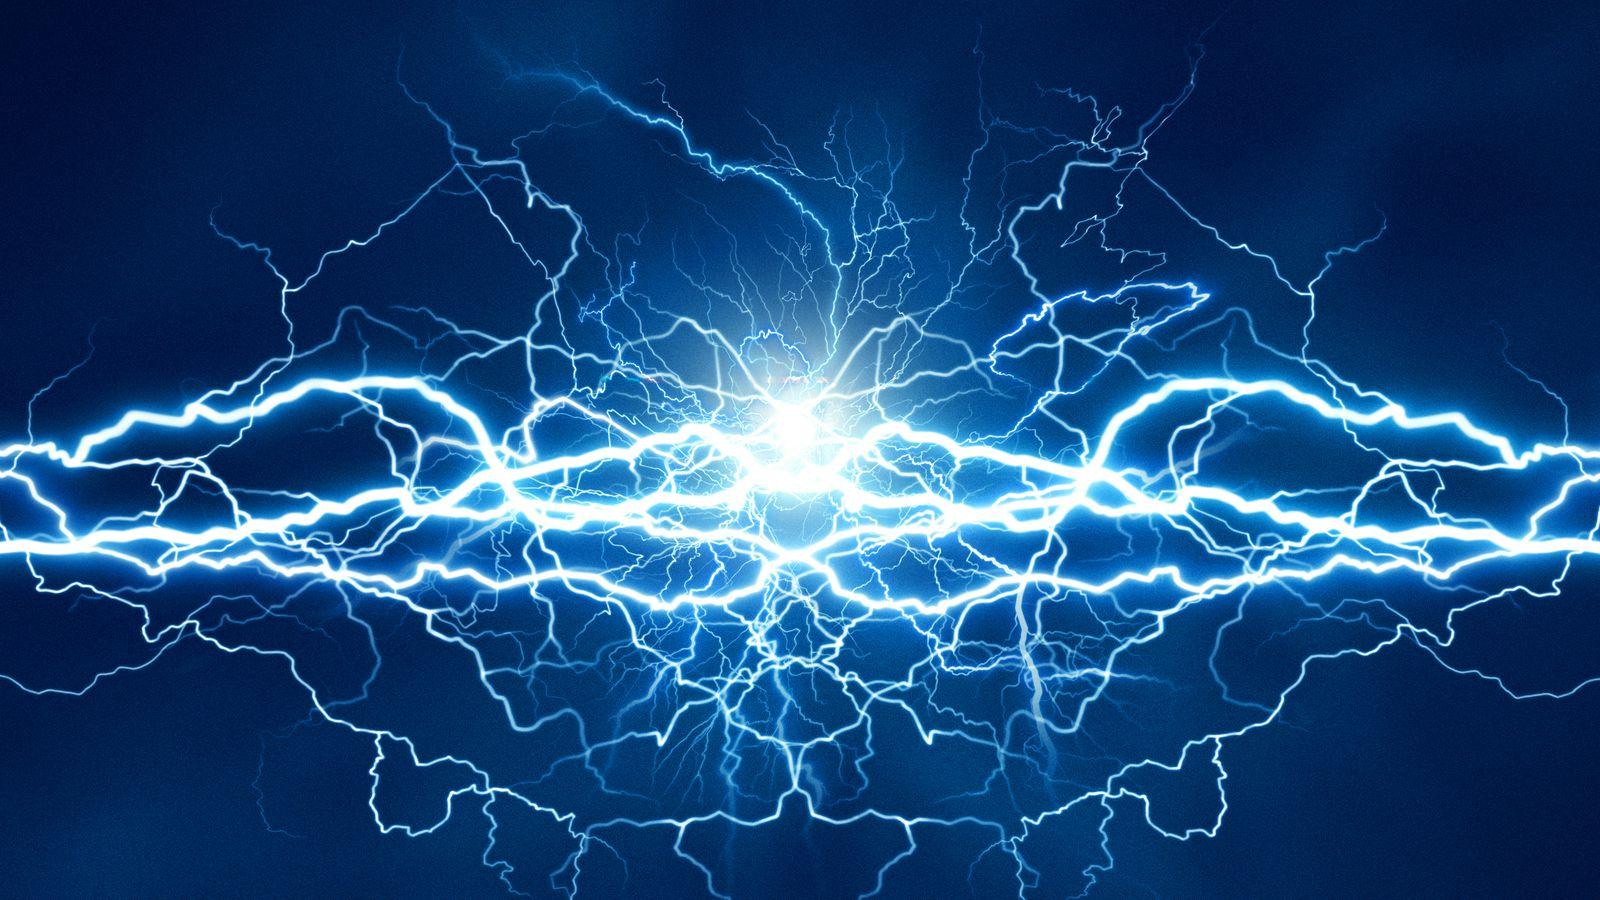 Blueelectricity.jpg